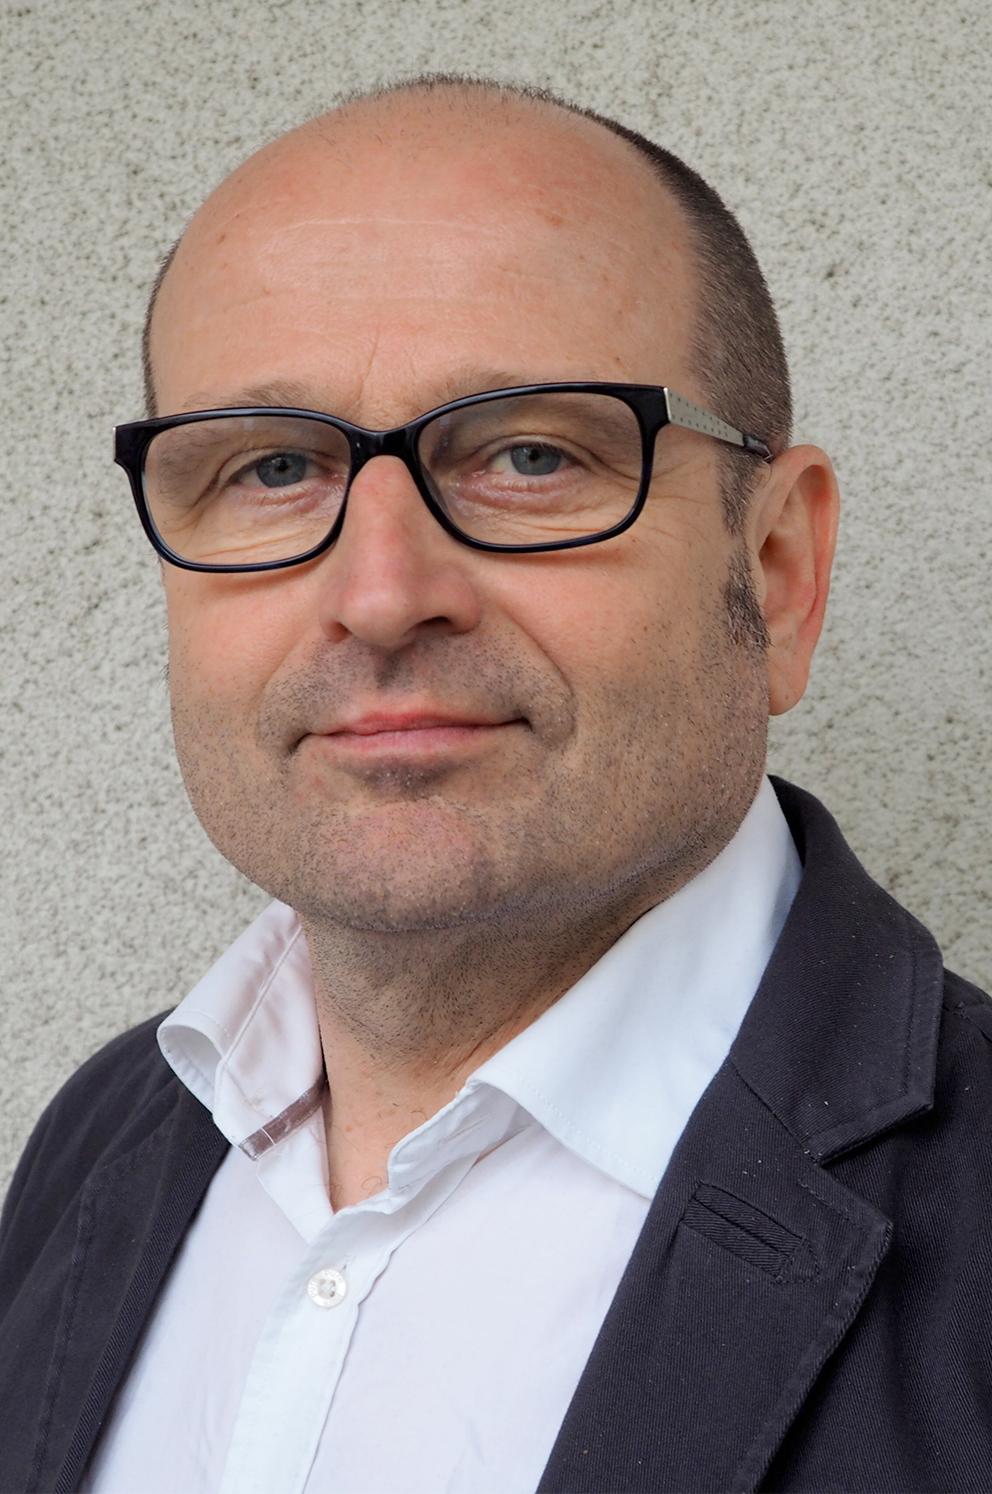 Christian Aigner - Wiener Leadership Kongress 2017